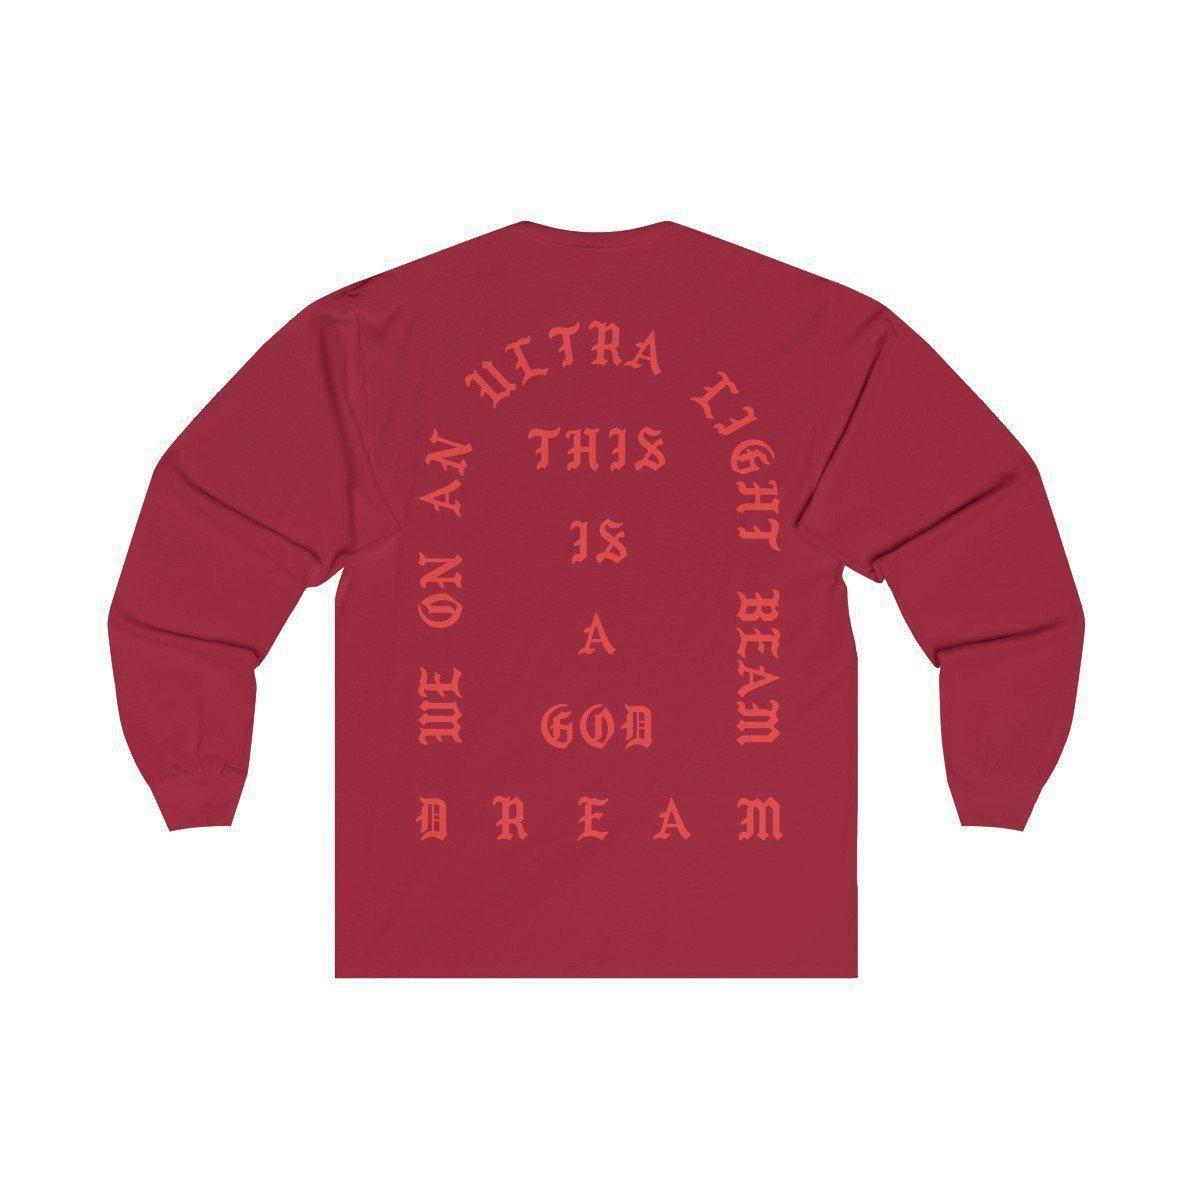 I Feel Like Pablo Unisex Jersey Long Sleeve Tee Kanye West Merch Tlop The Life Of Pablo Inspired Long Sleeve Tees Life Of Pablo Merch Kanye West